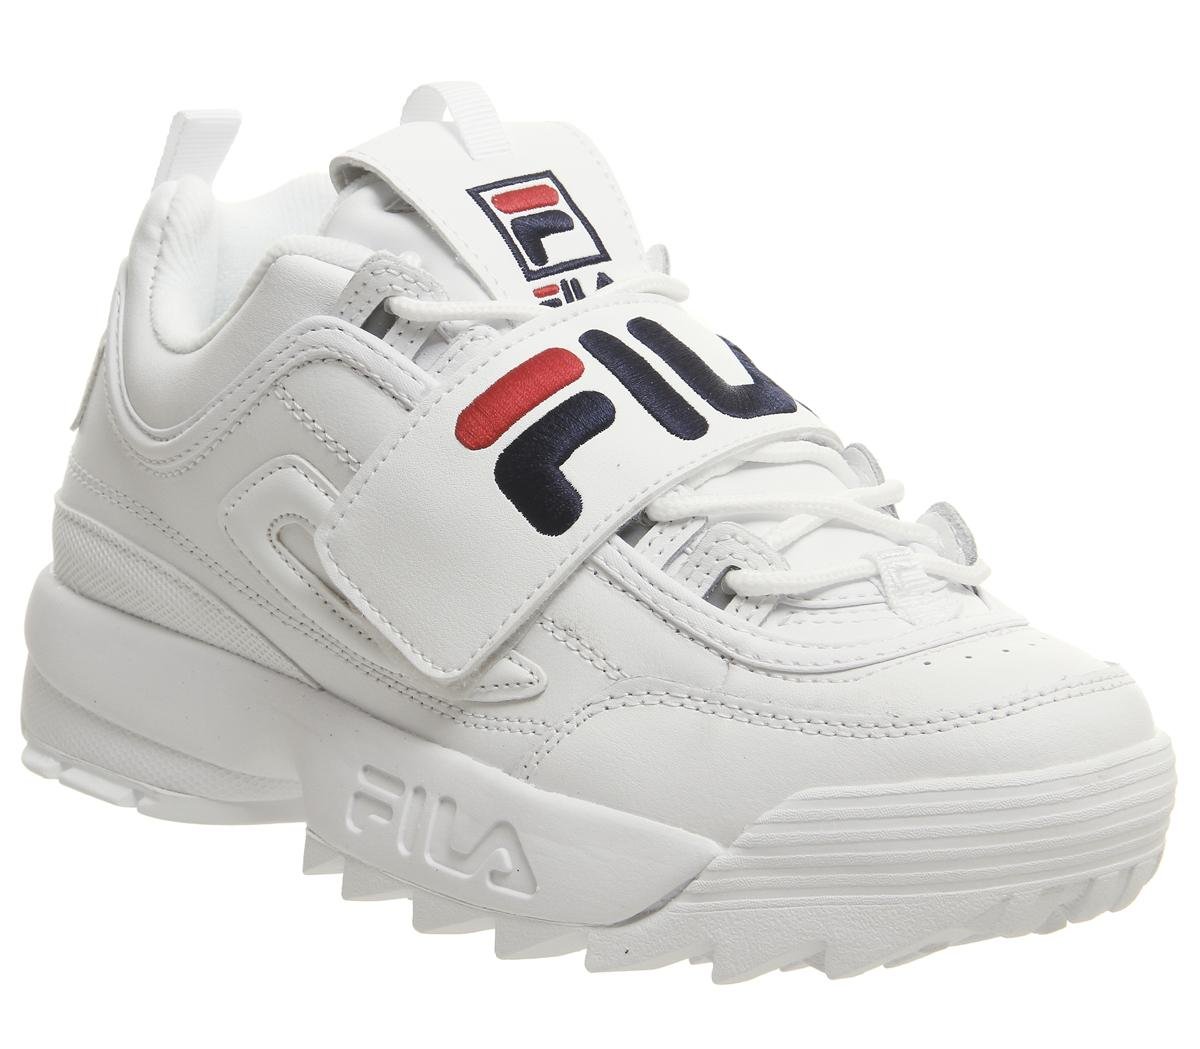 fila white velcro shoes Sale Fila Shoes